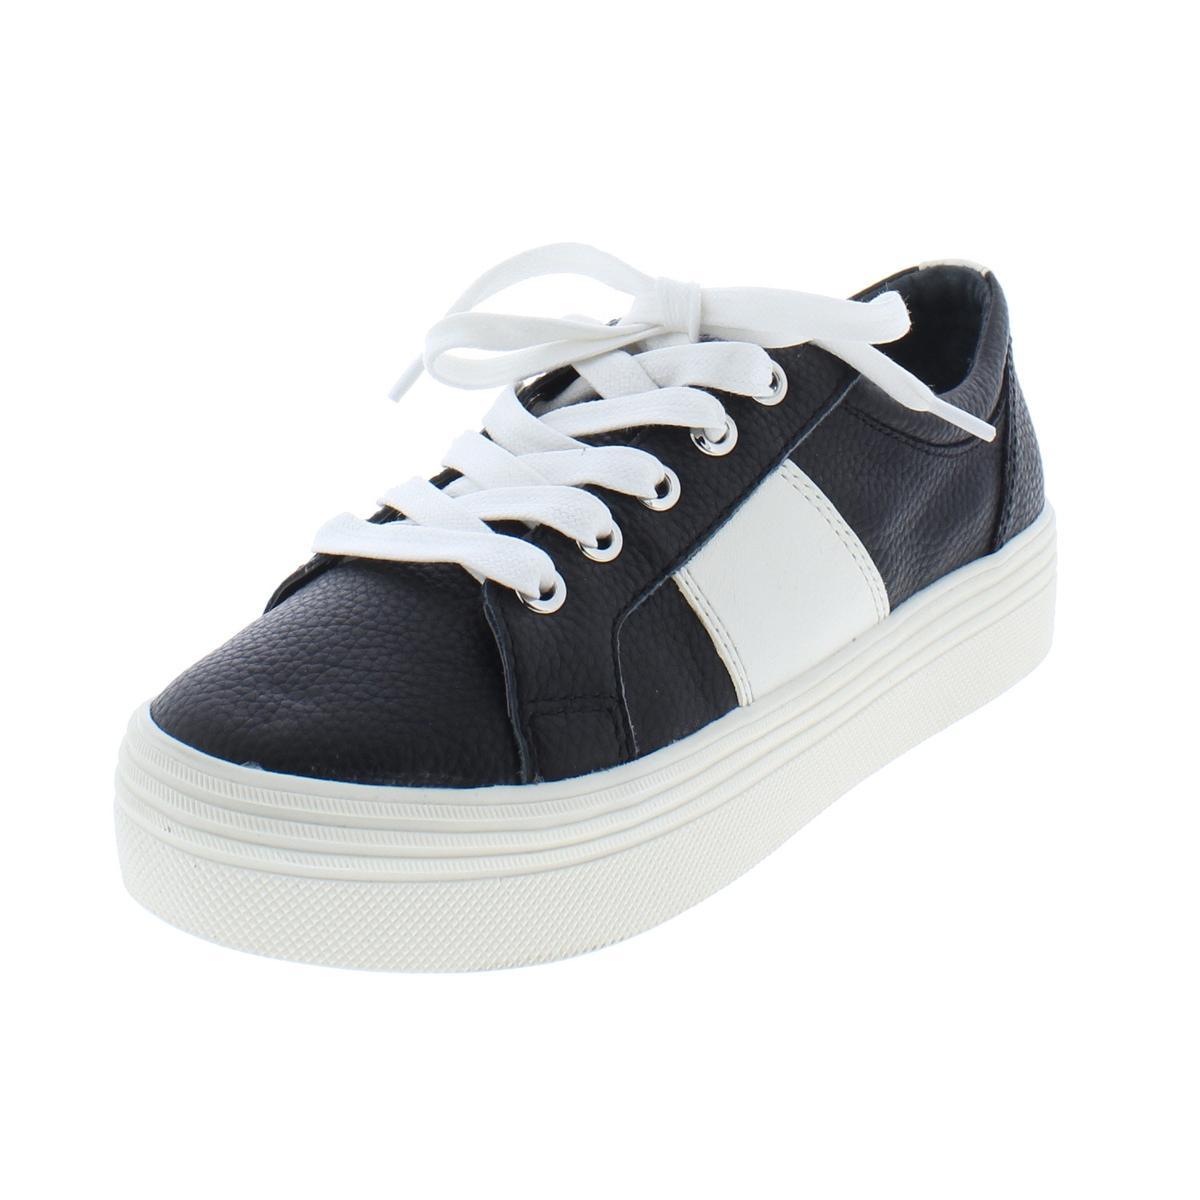 69af3456e53f Details about Dolce Vita Womens Tavina Black-Ivory Casual Shoes 7.5 Medium  (B